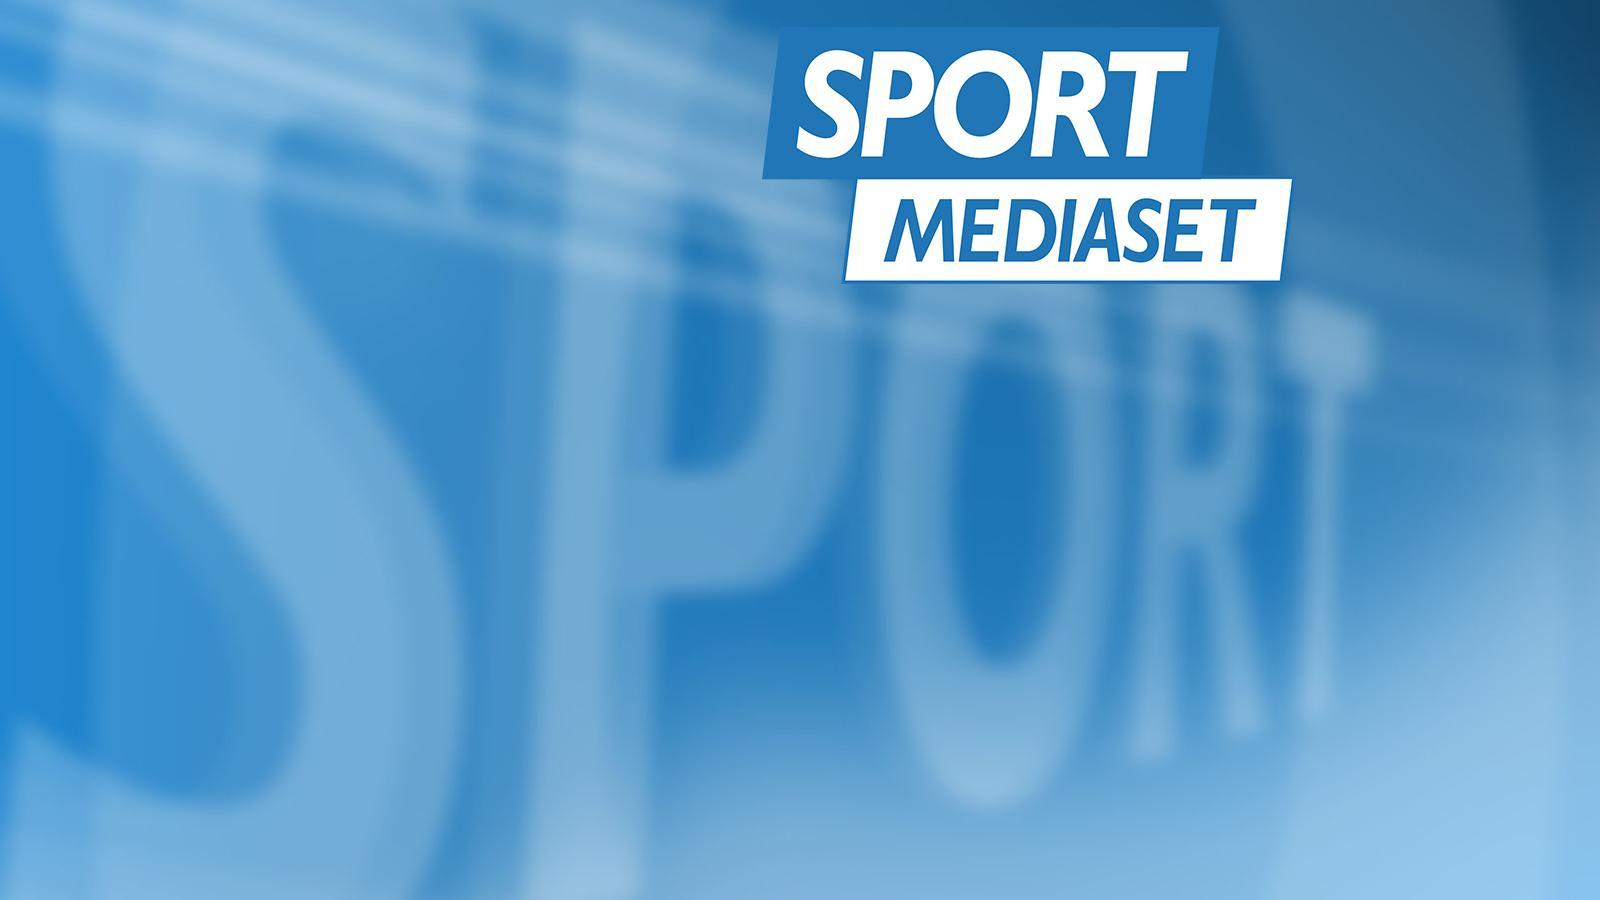 Italia 1 Sport Mediaset '21